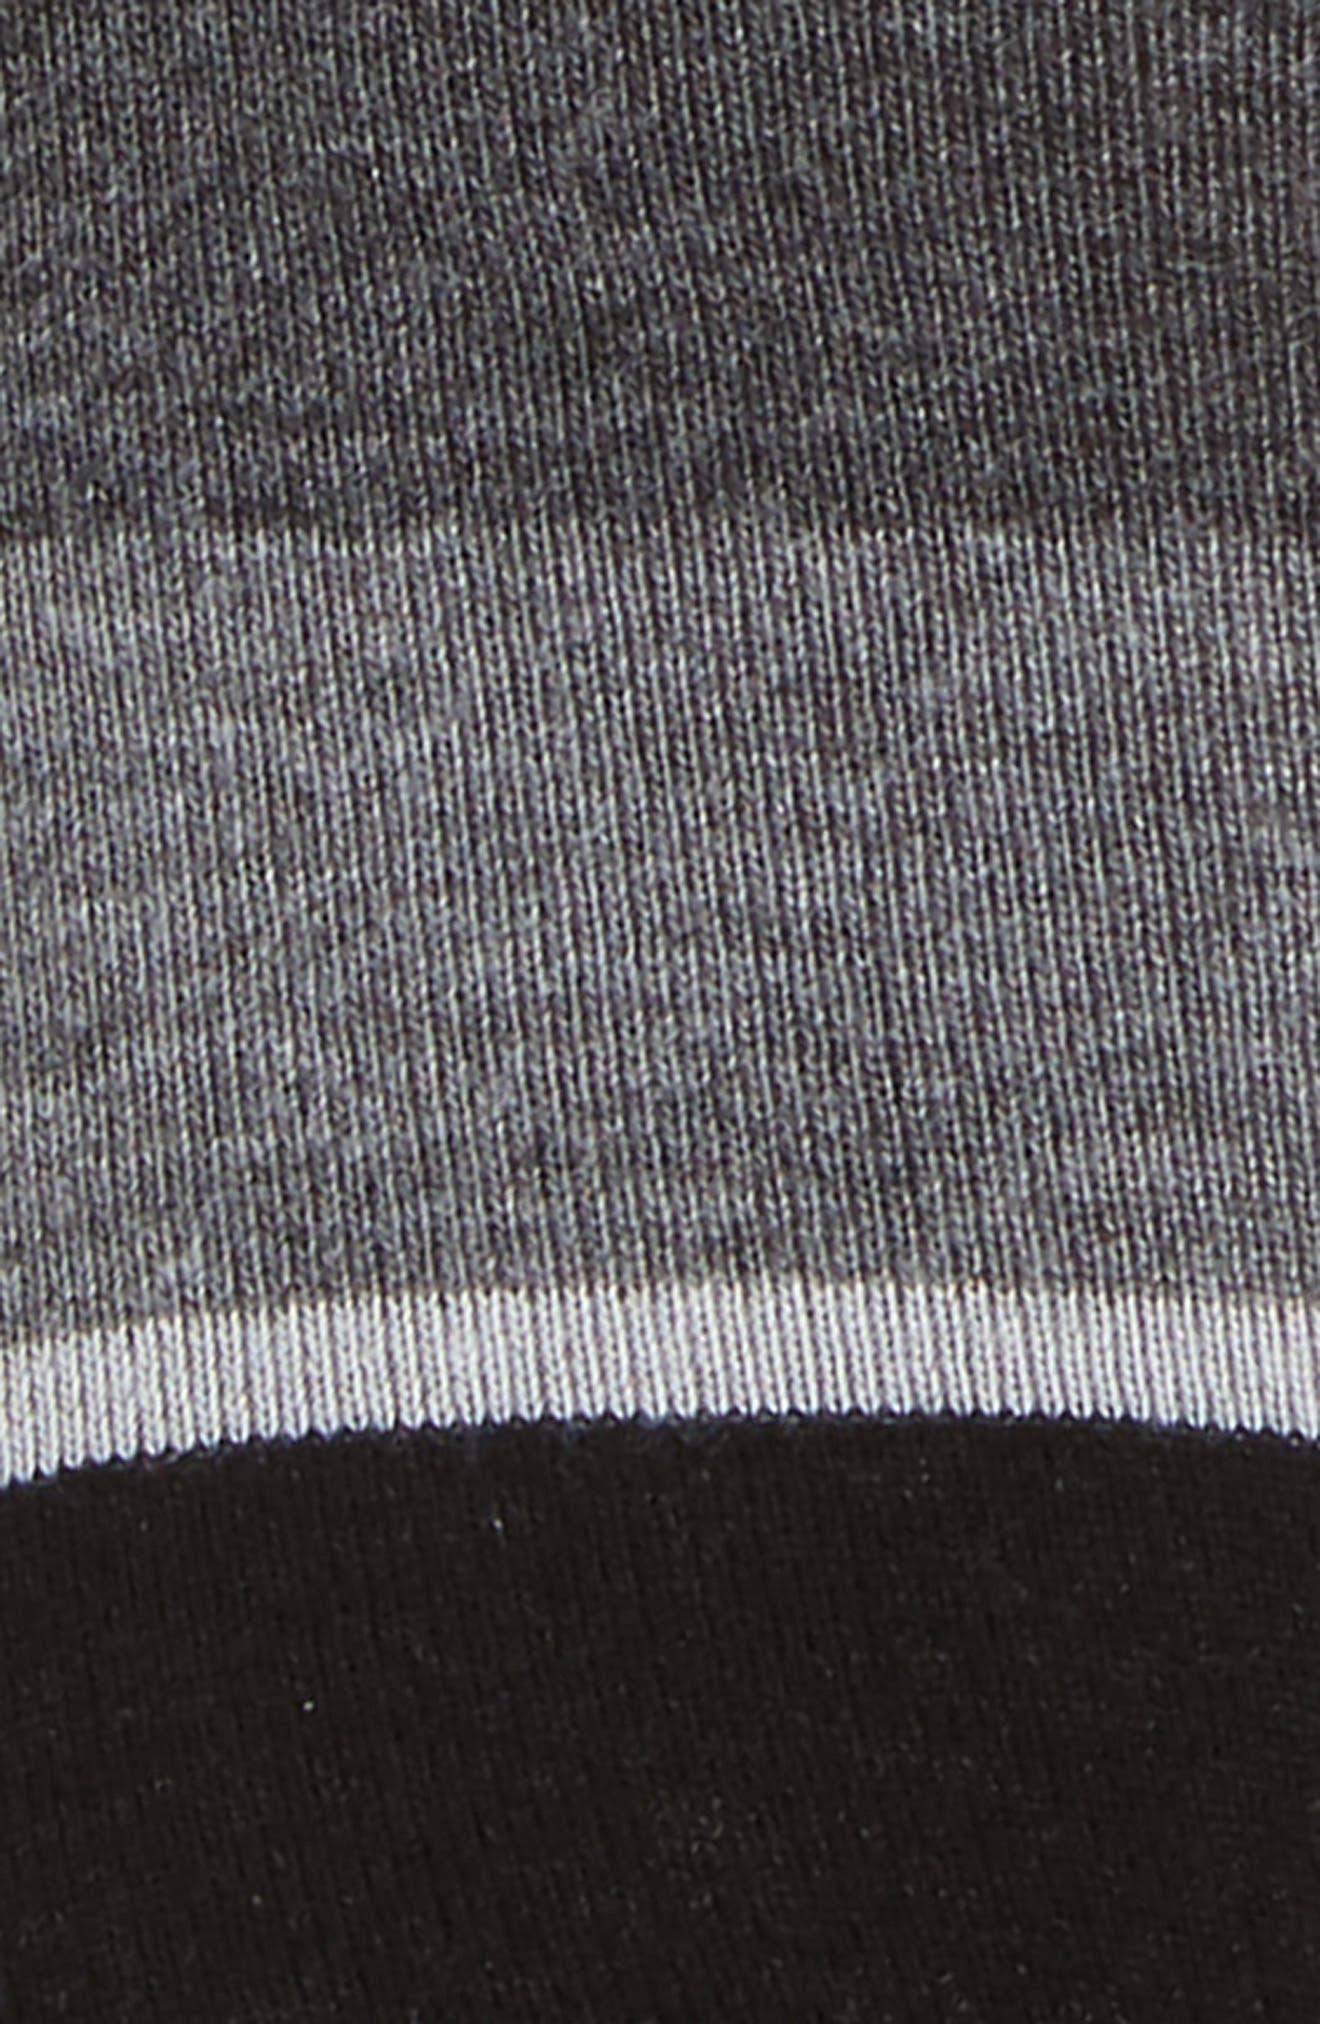 Colorblock Socks,                             Alternate thumbnail 3, color,